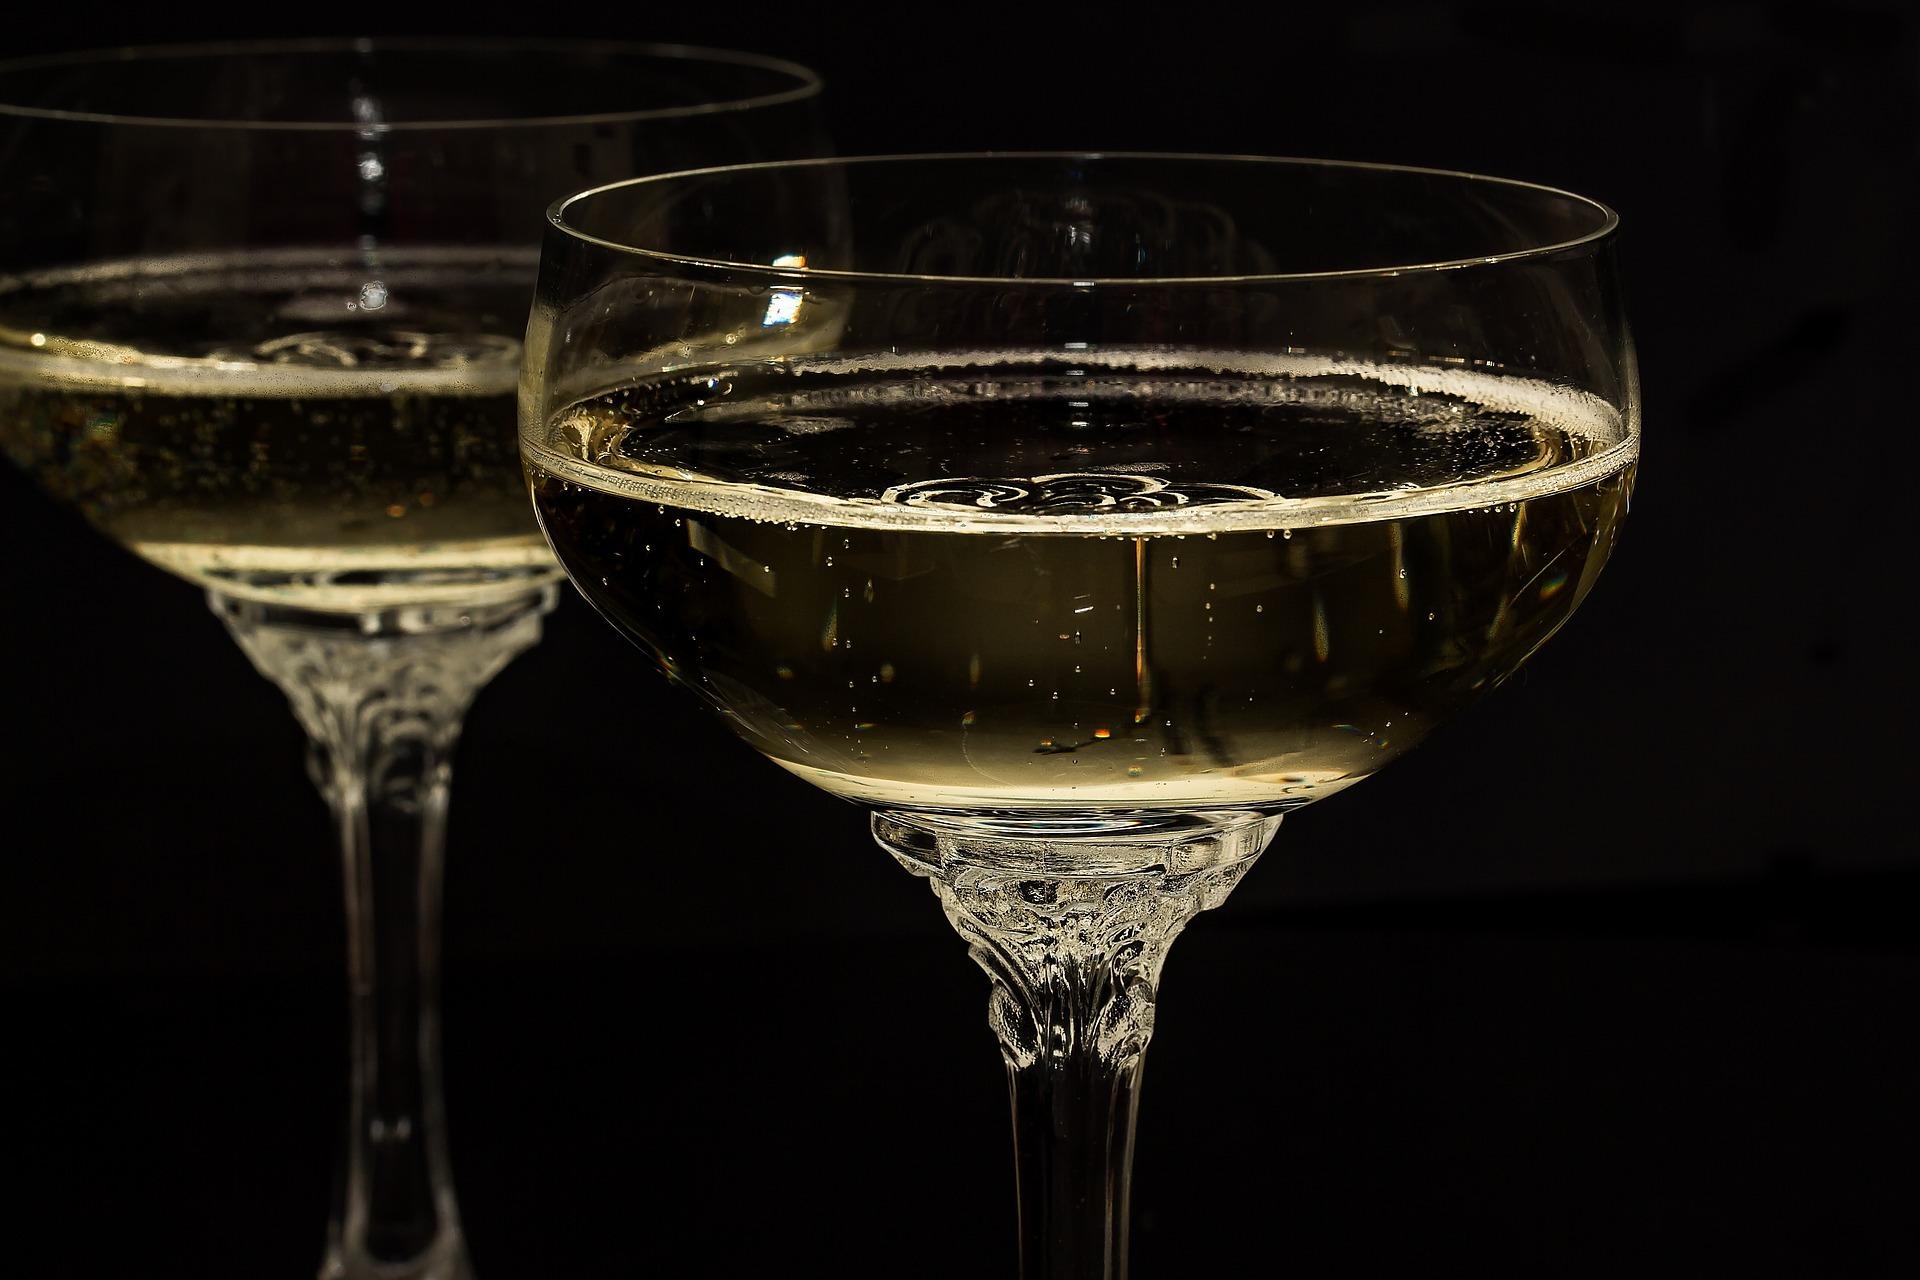 champagne-glasses-1940262_1920.jpg